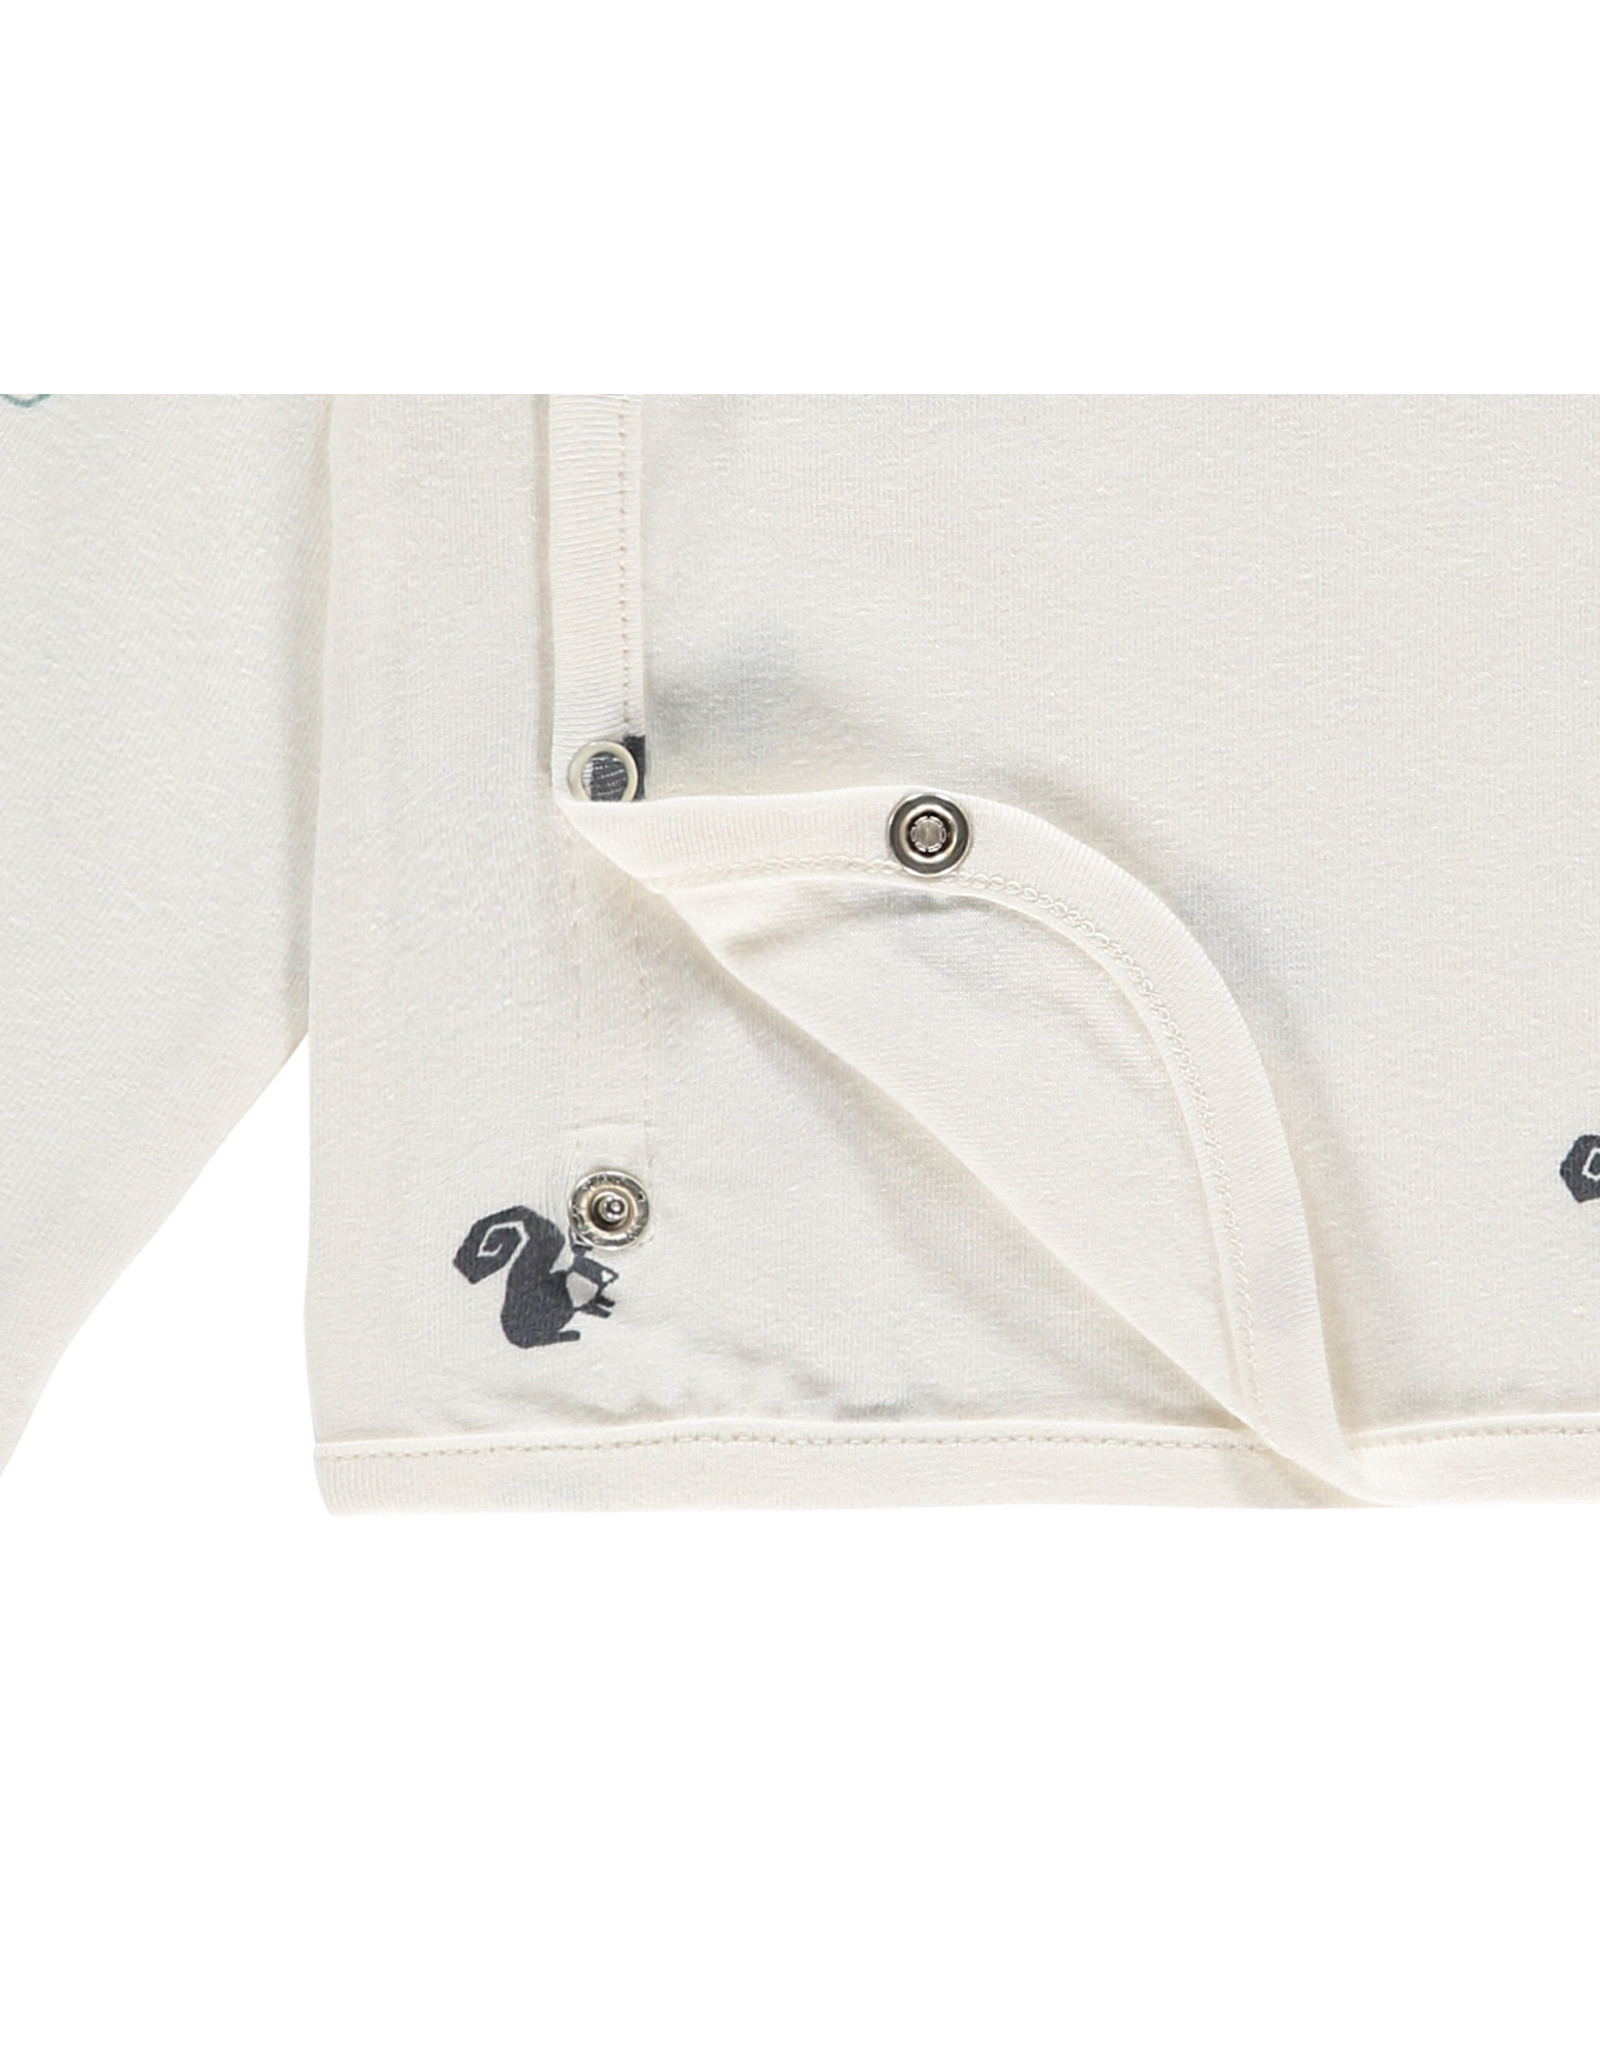 Noppies U T-shirt overlap Krimpton aop, Whisper White